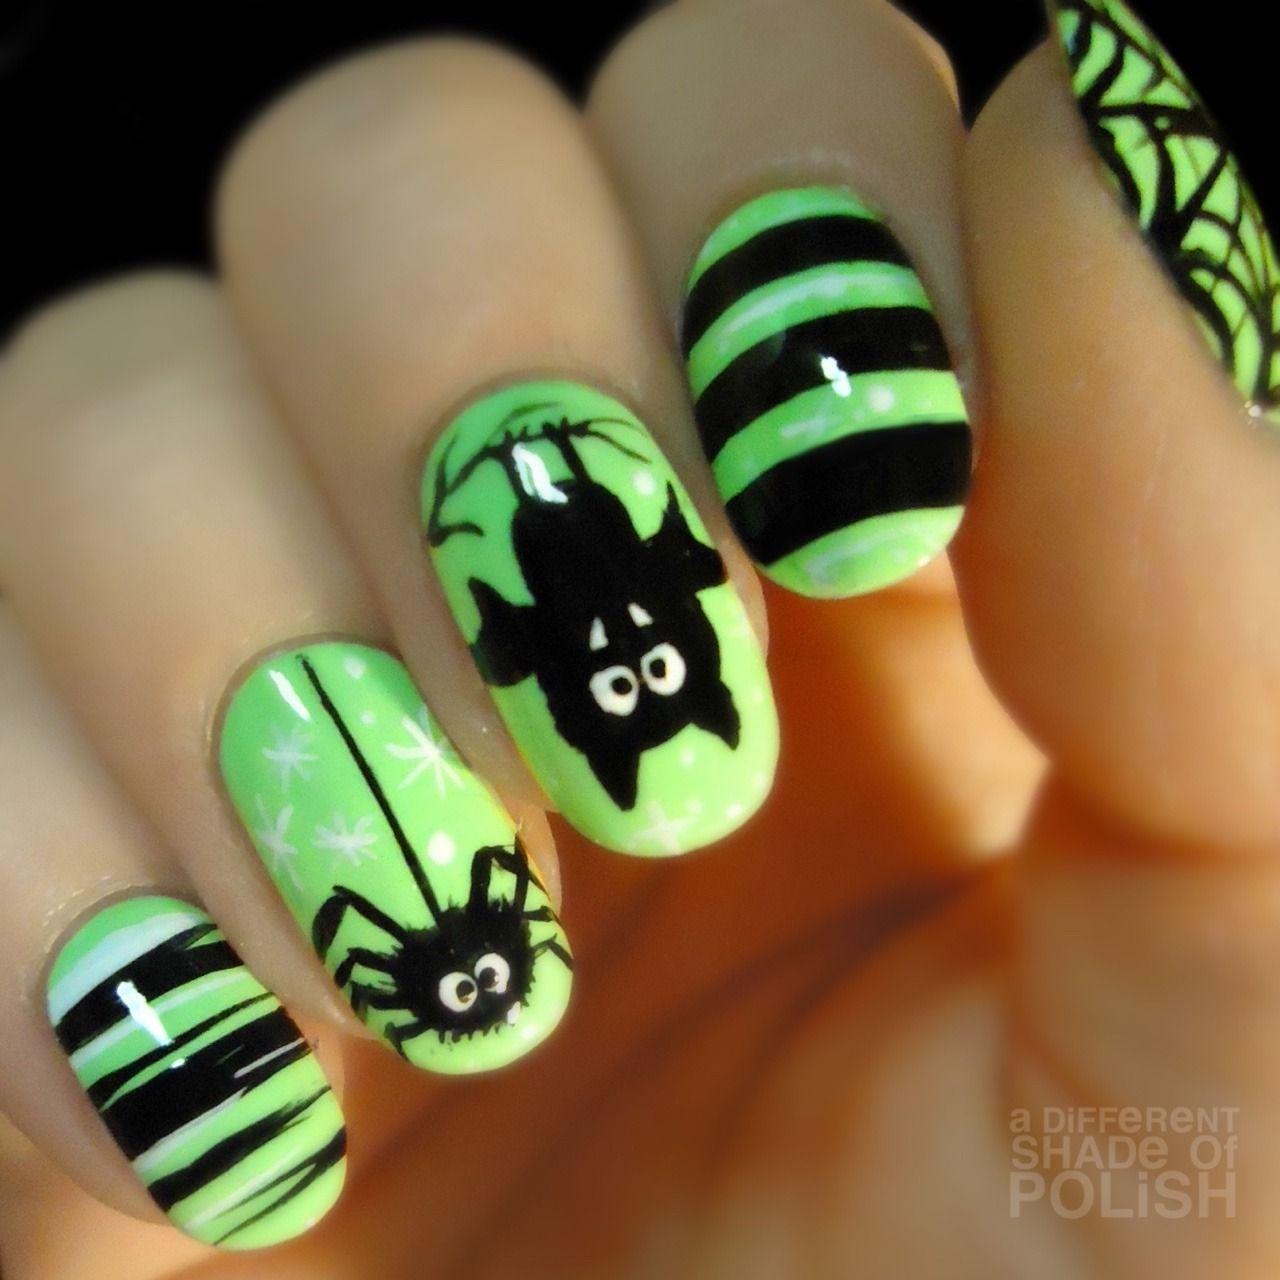 Cute Simple Halloween Nails Halloween Bat Nail Art Bat Nails Art Halloween Bat Nails